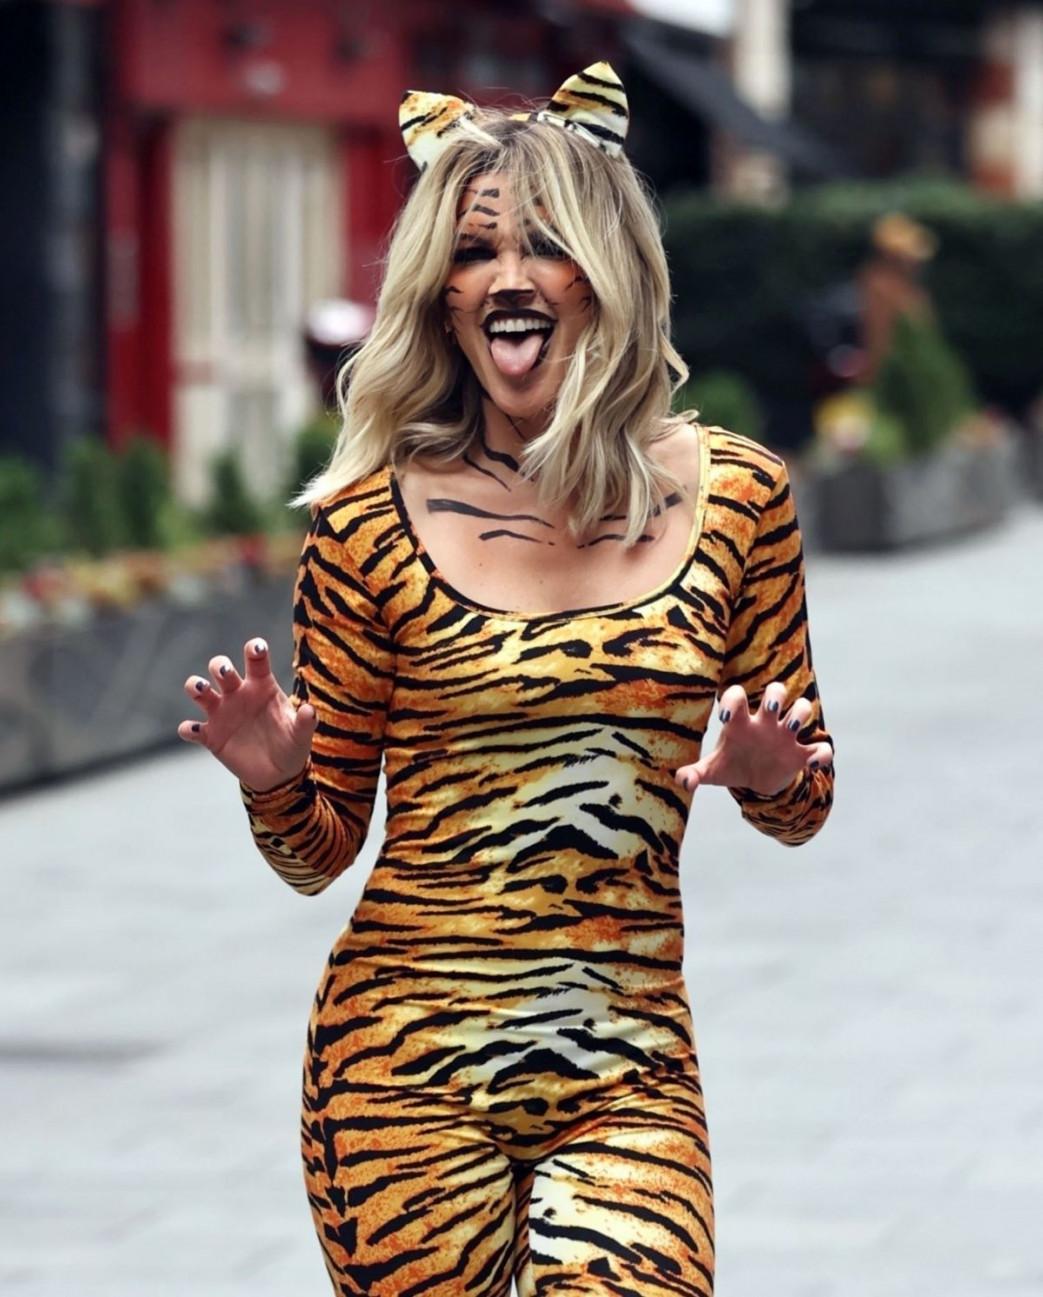 Ashley-Roberts-Stunning-in-Tiger-Catsuit-12.jpg